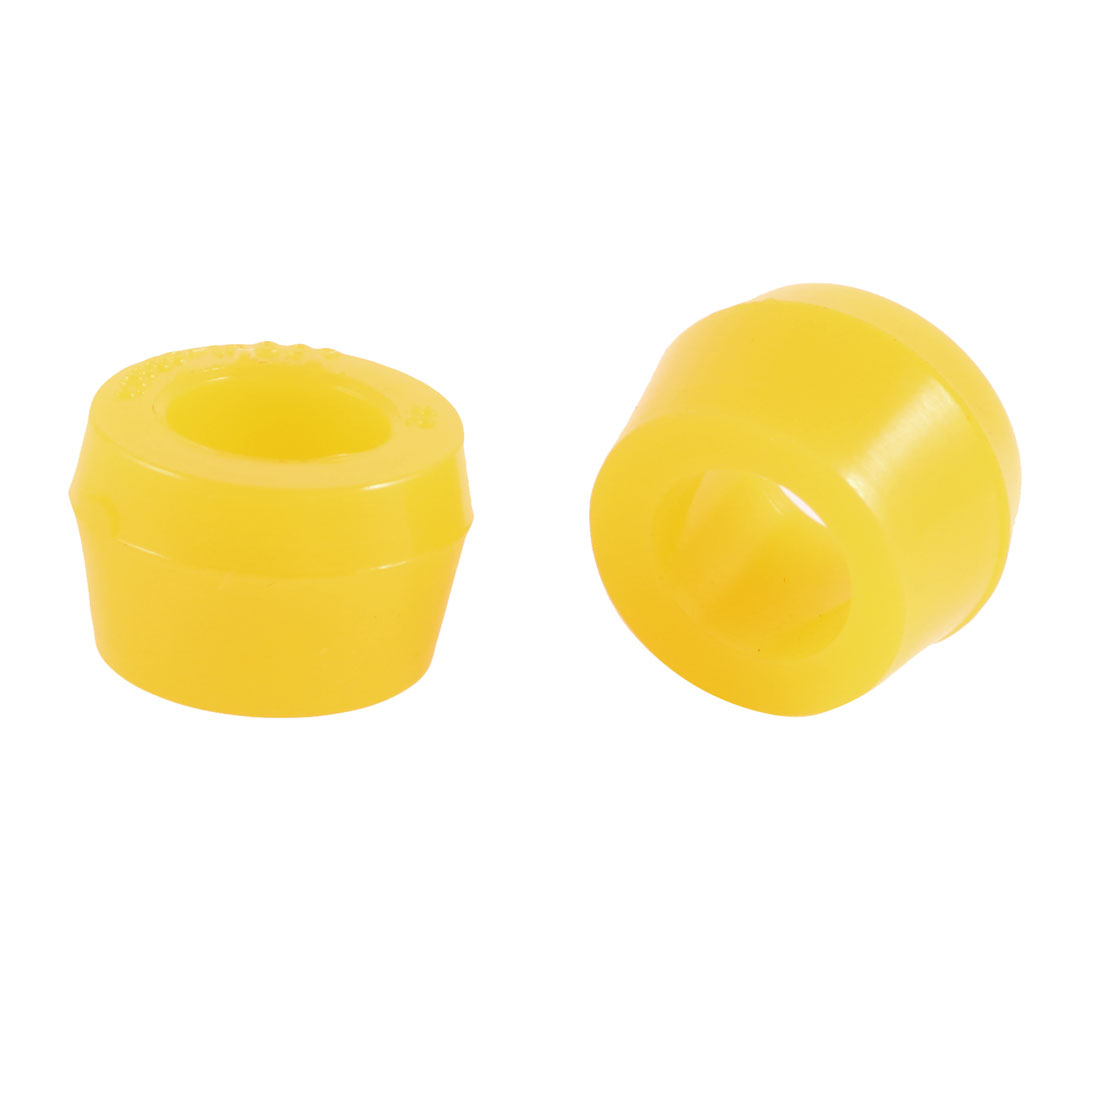 2 Pcs Auto Car Truck Shock Absorber Bushings 27mm x 16mm x 18mm Yellow